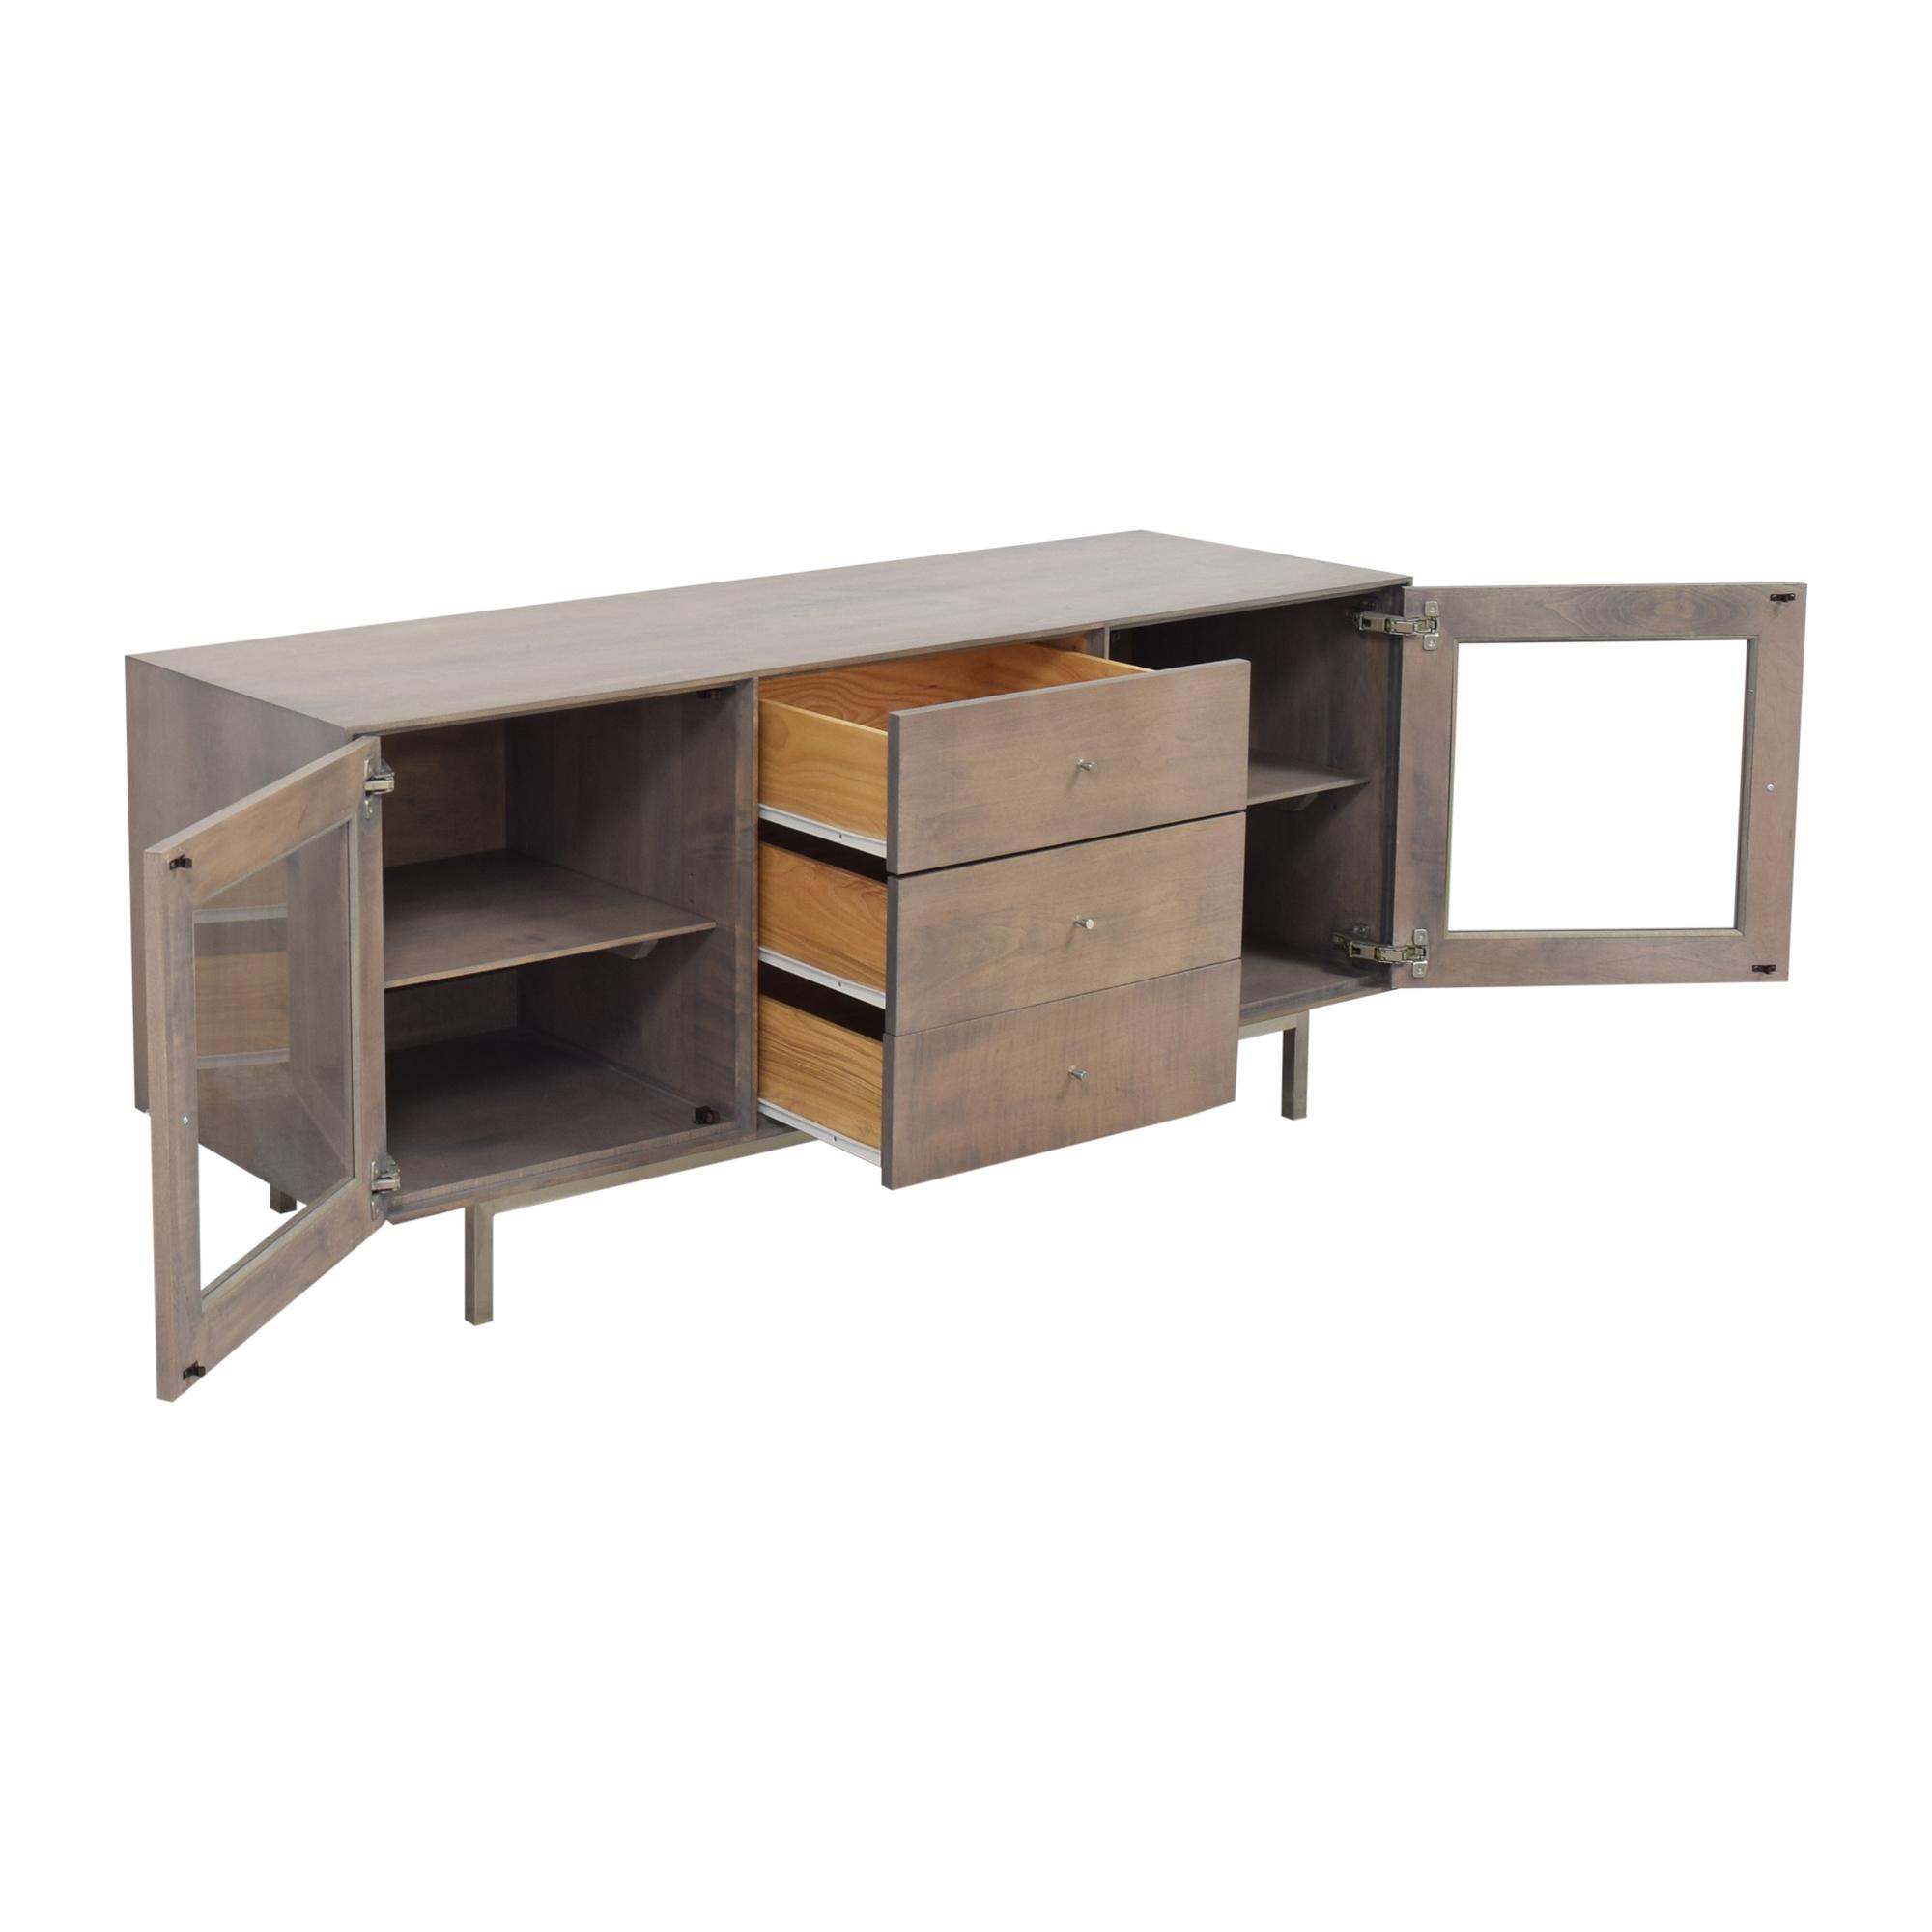 Room & Board Room & Board Hudson Media Cabinet Storage